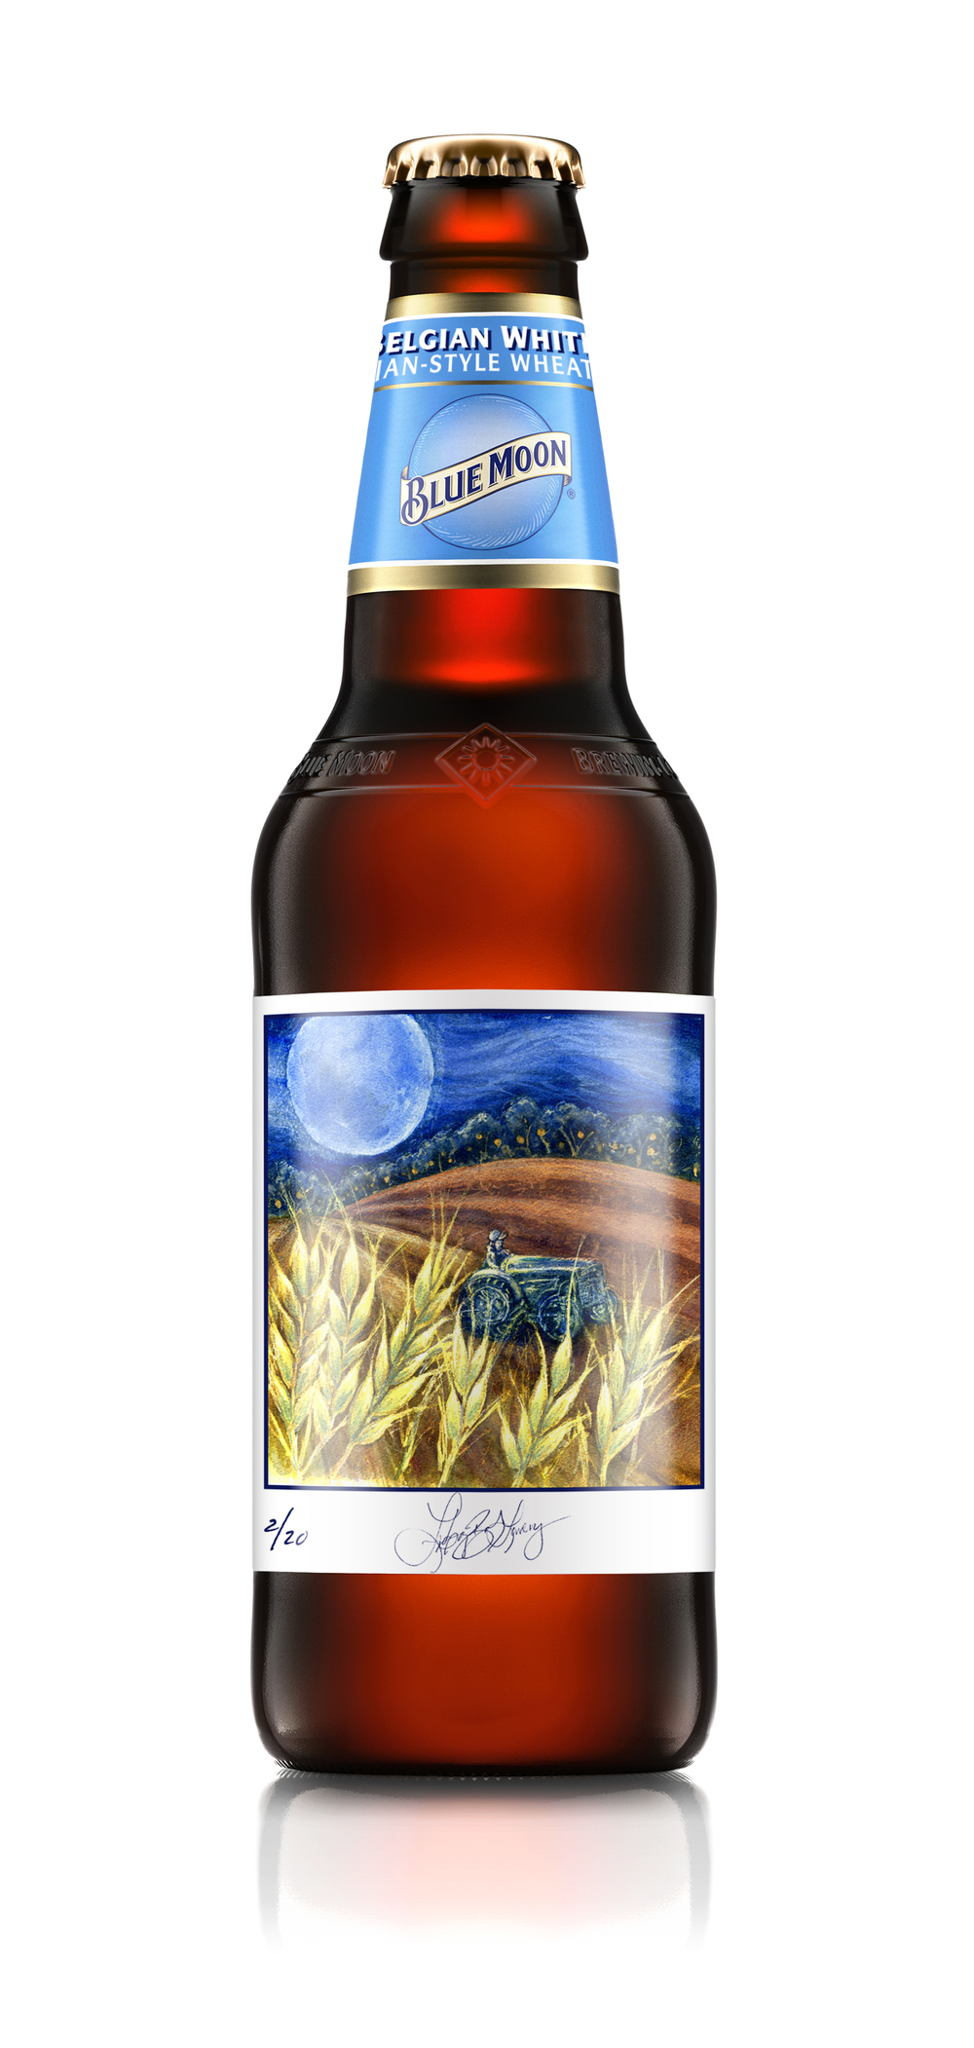 BMO-195A_Bottle_12z_Render_LindsayBolenLowery_150401_FJ.jpg